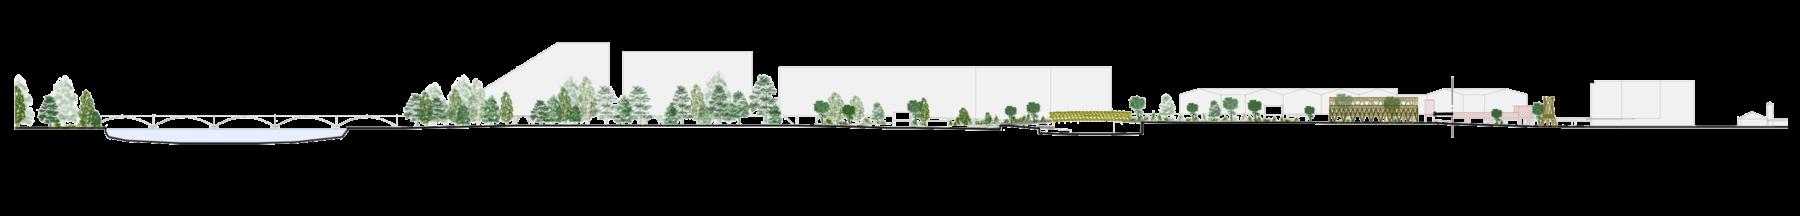 Sarah-Wigglesworth-Architects Kingston-Mini-Holland Context LongSection 3600